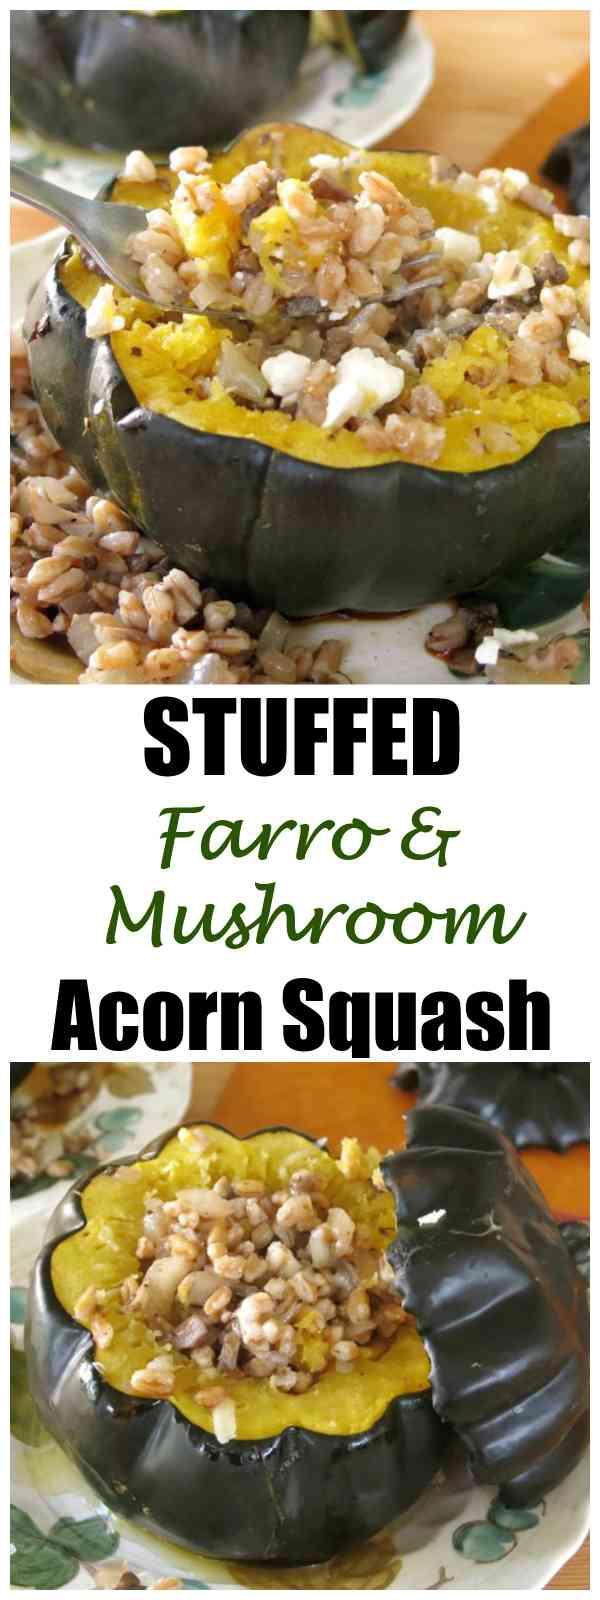 Stuffed Acorn Squash with Farro and Mushrooms